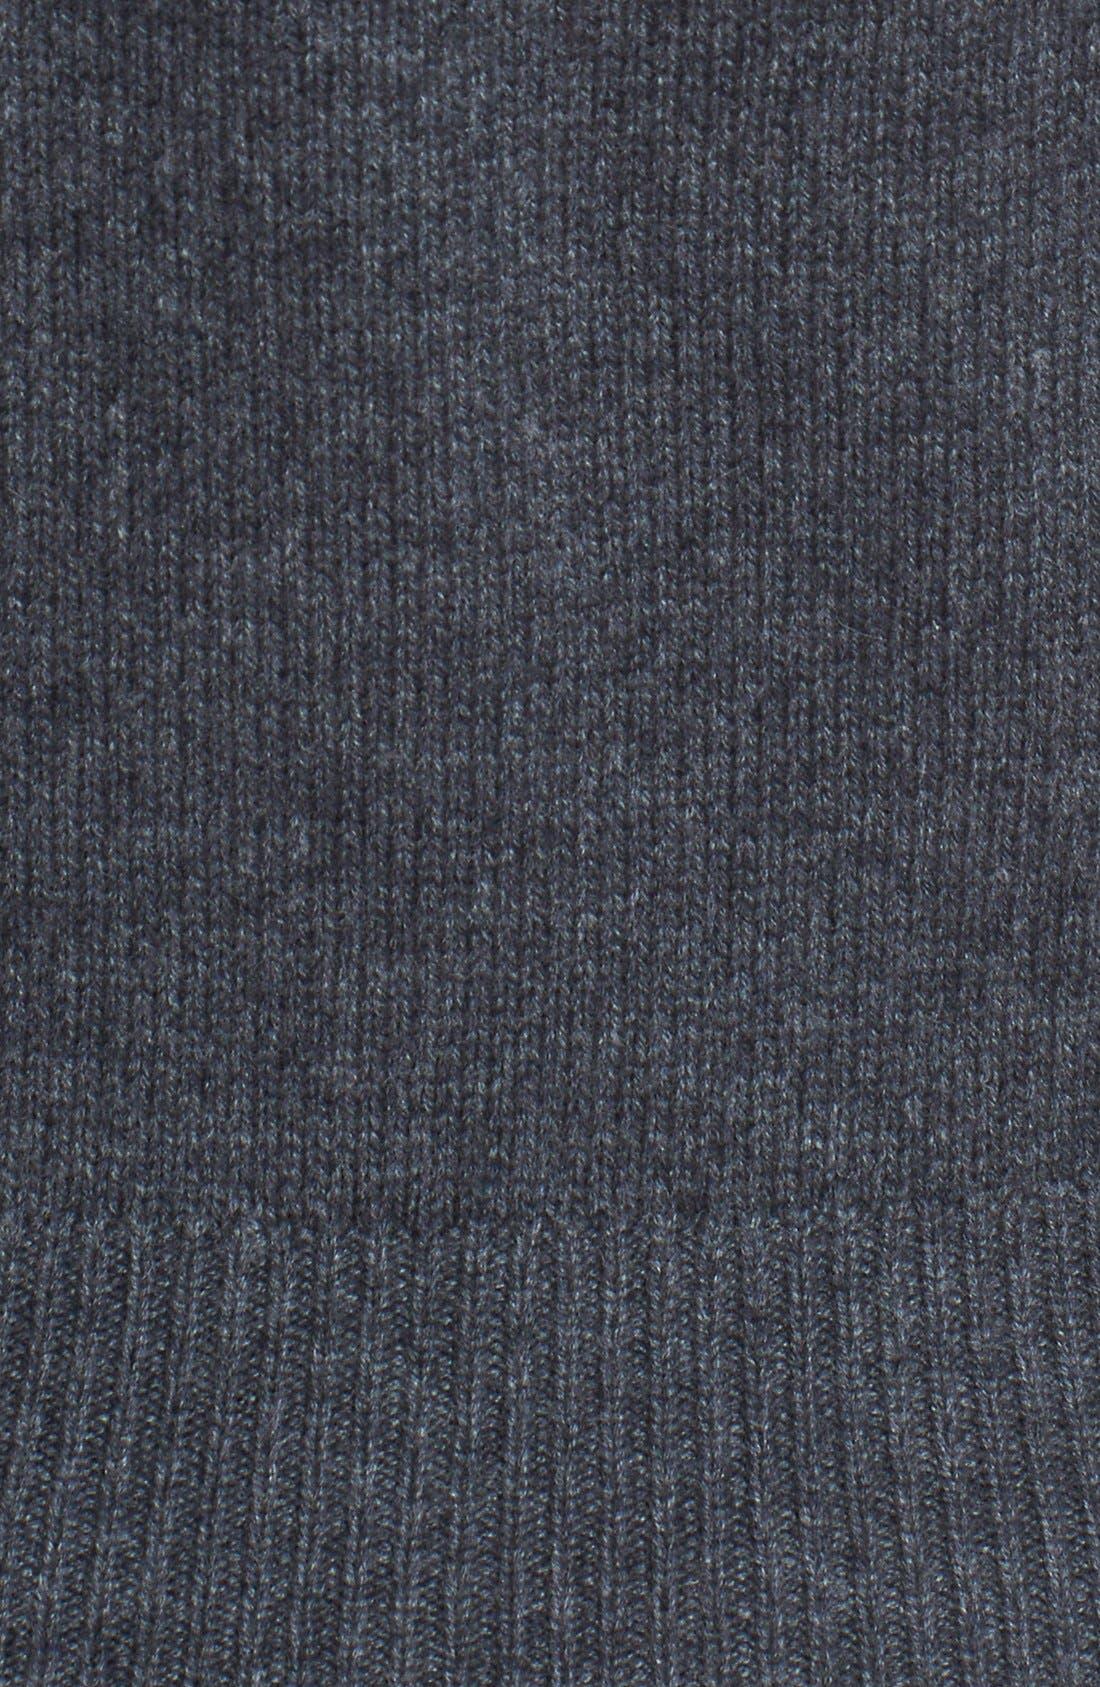 BURBERRY LONDON,                             Embellished Crewneck Sweater,                             Alternate thumbnail 2, color,                             026